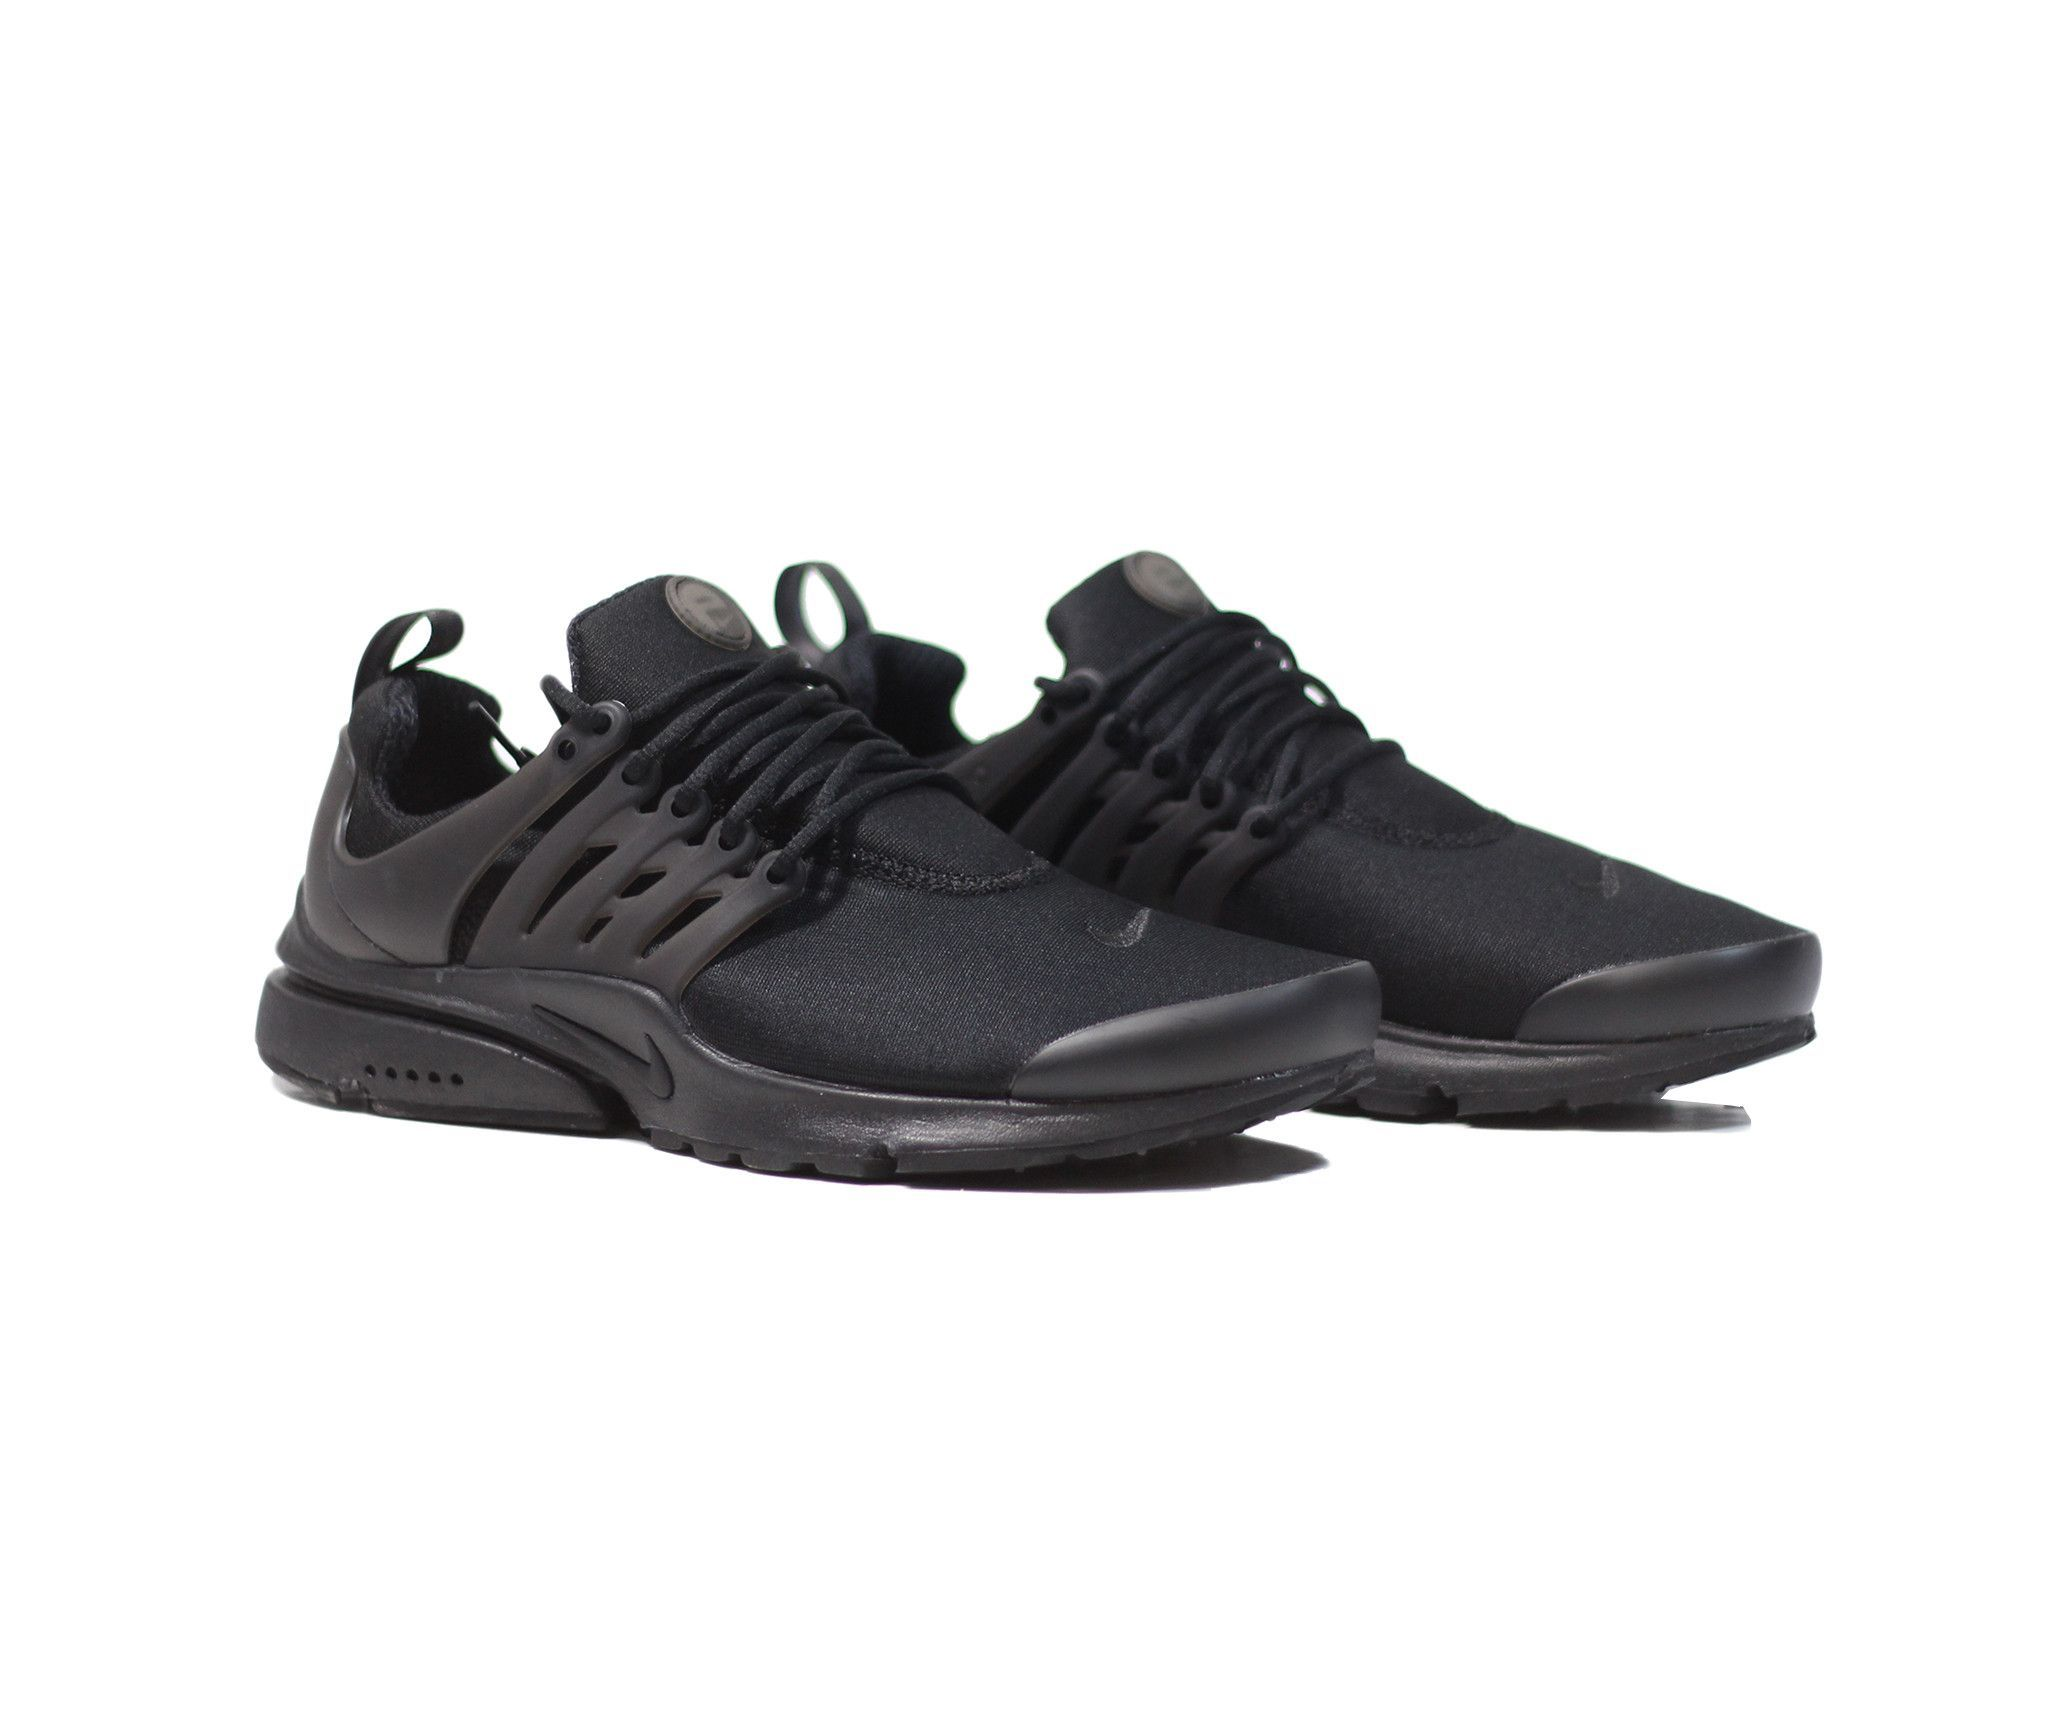 For Us Nike Air Presto Essential Black Black Black Nike Air Presto Nike Presto Outfit Shoe Boots